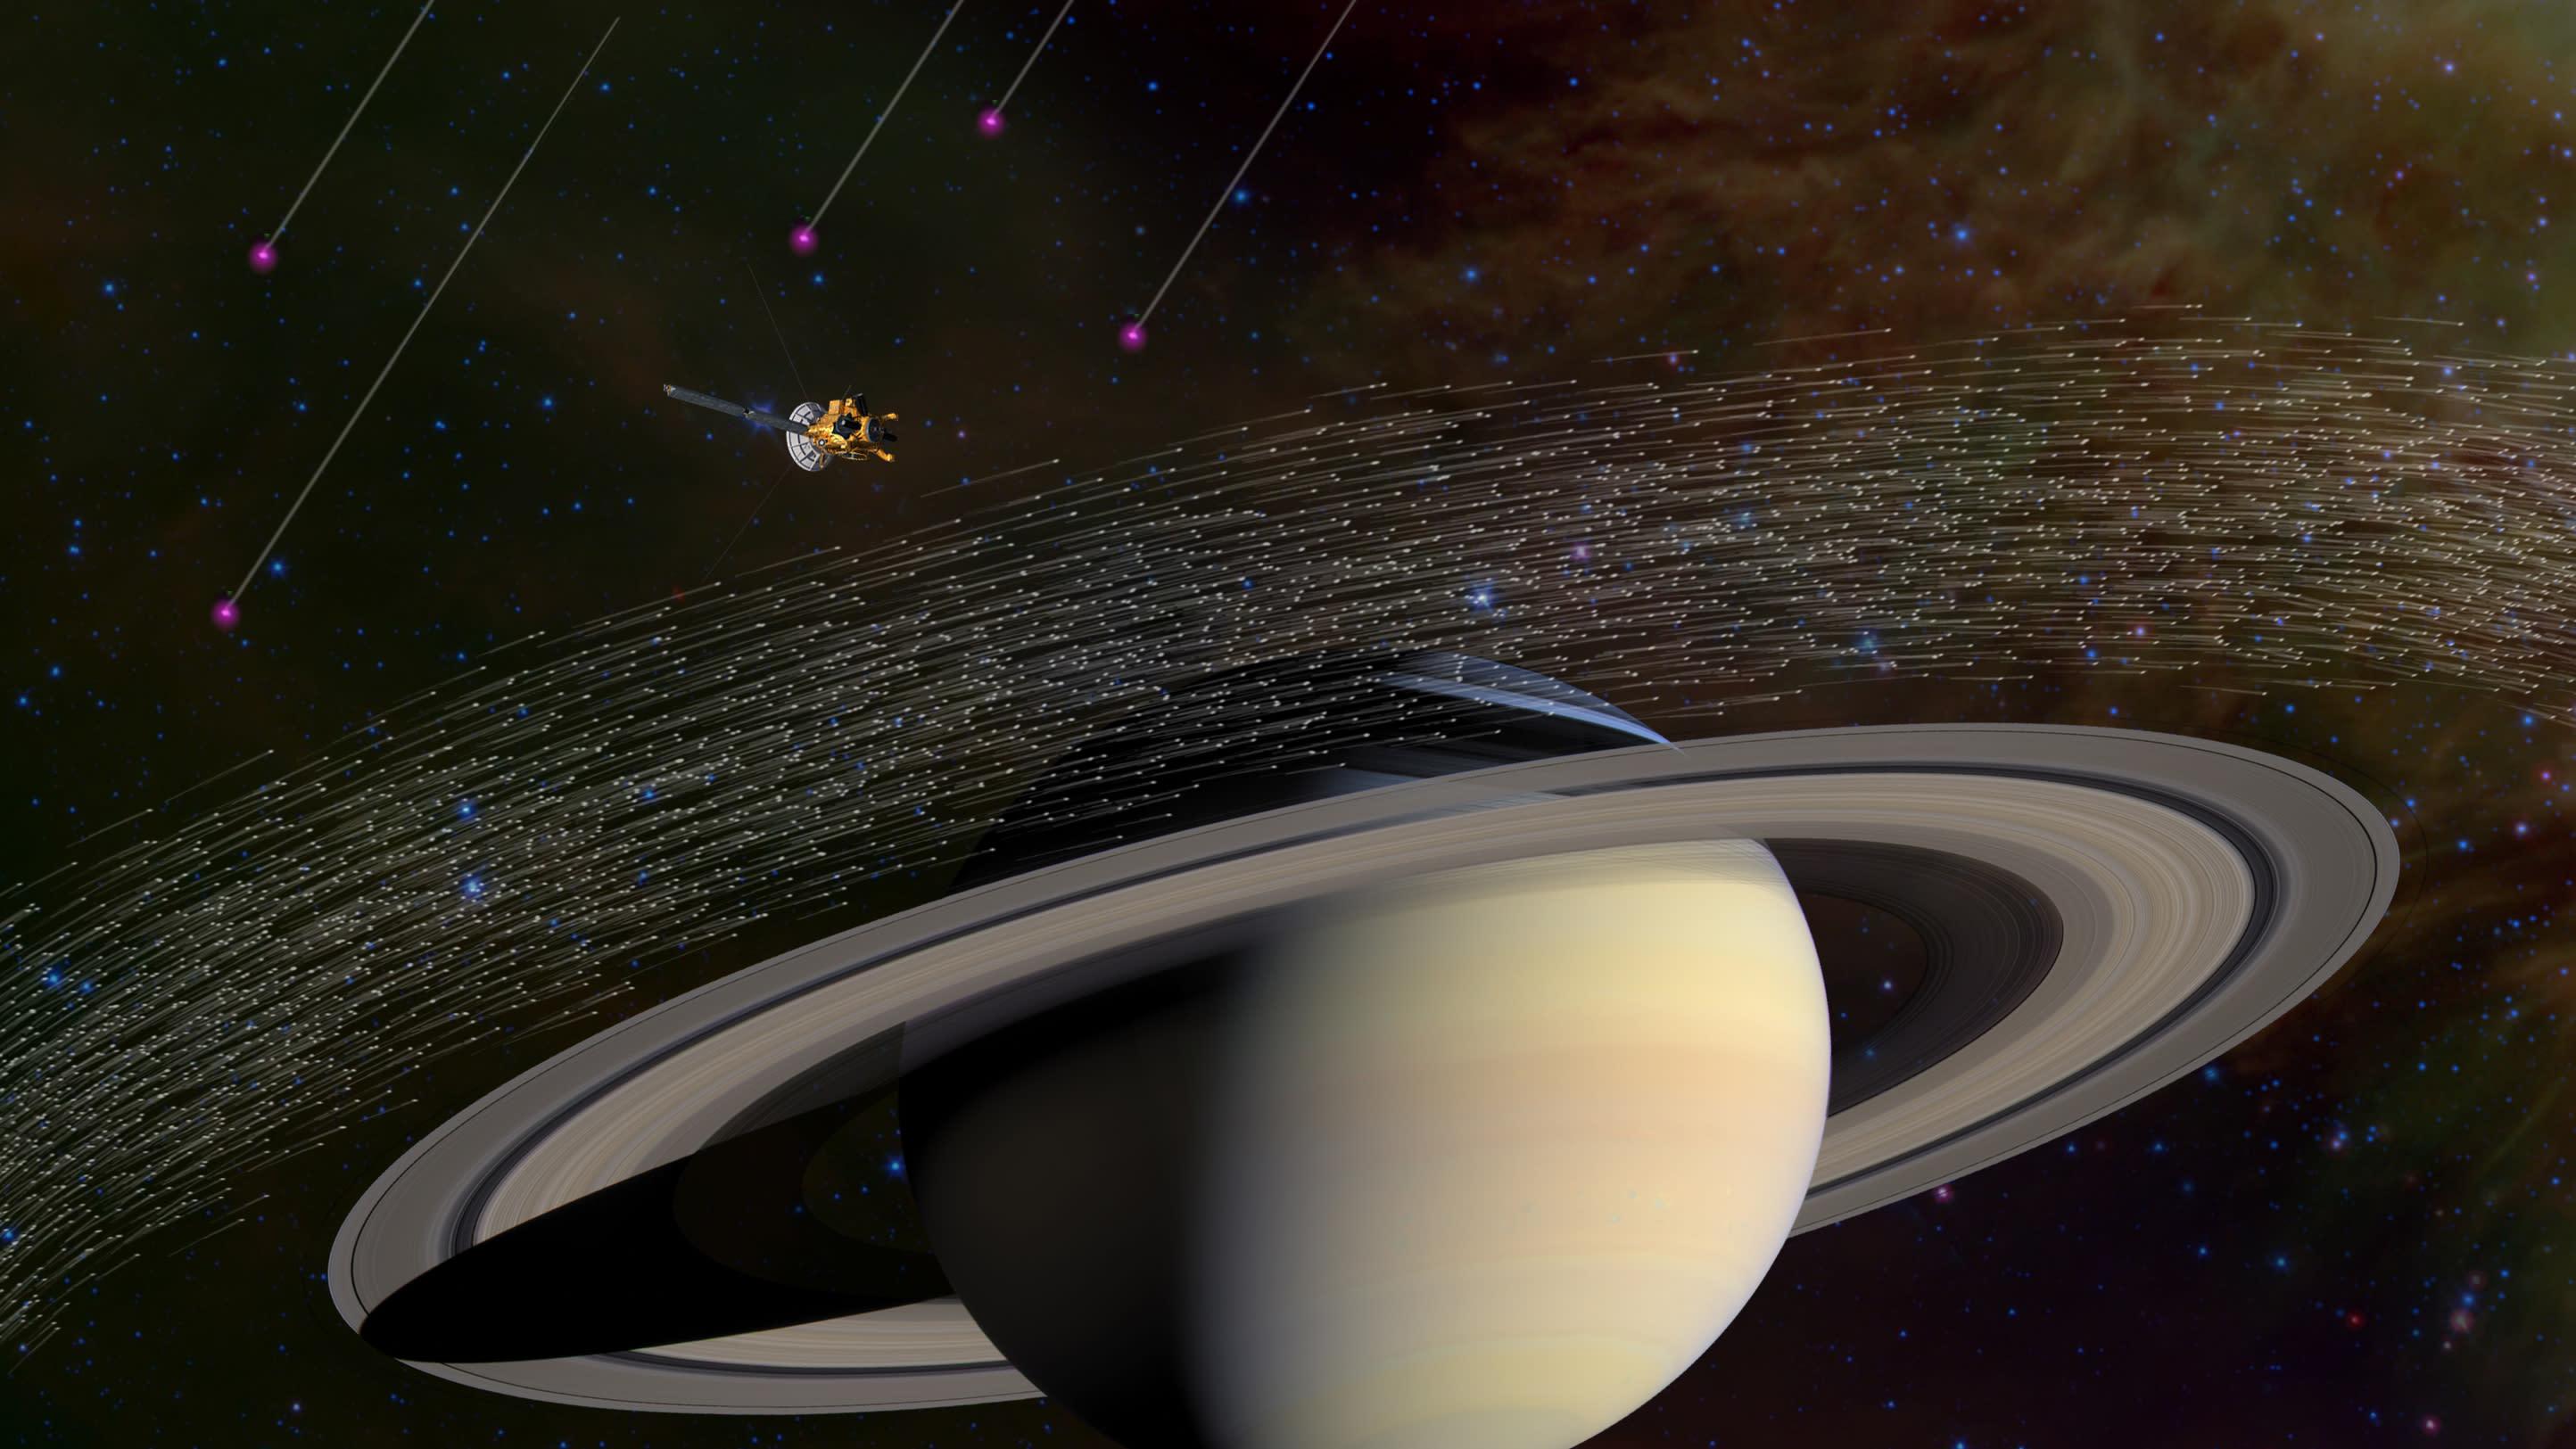 nasa planet sounds